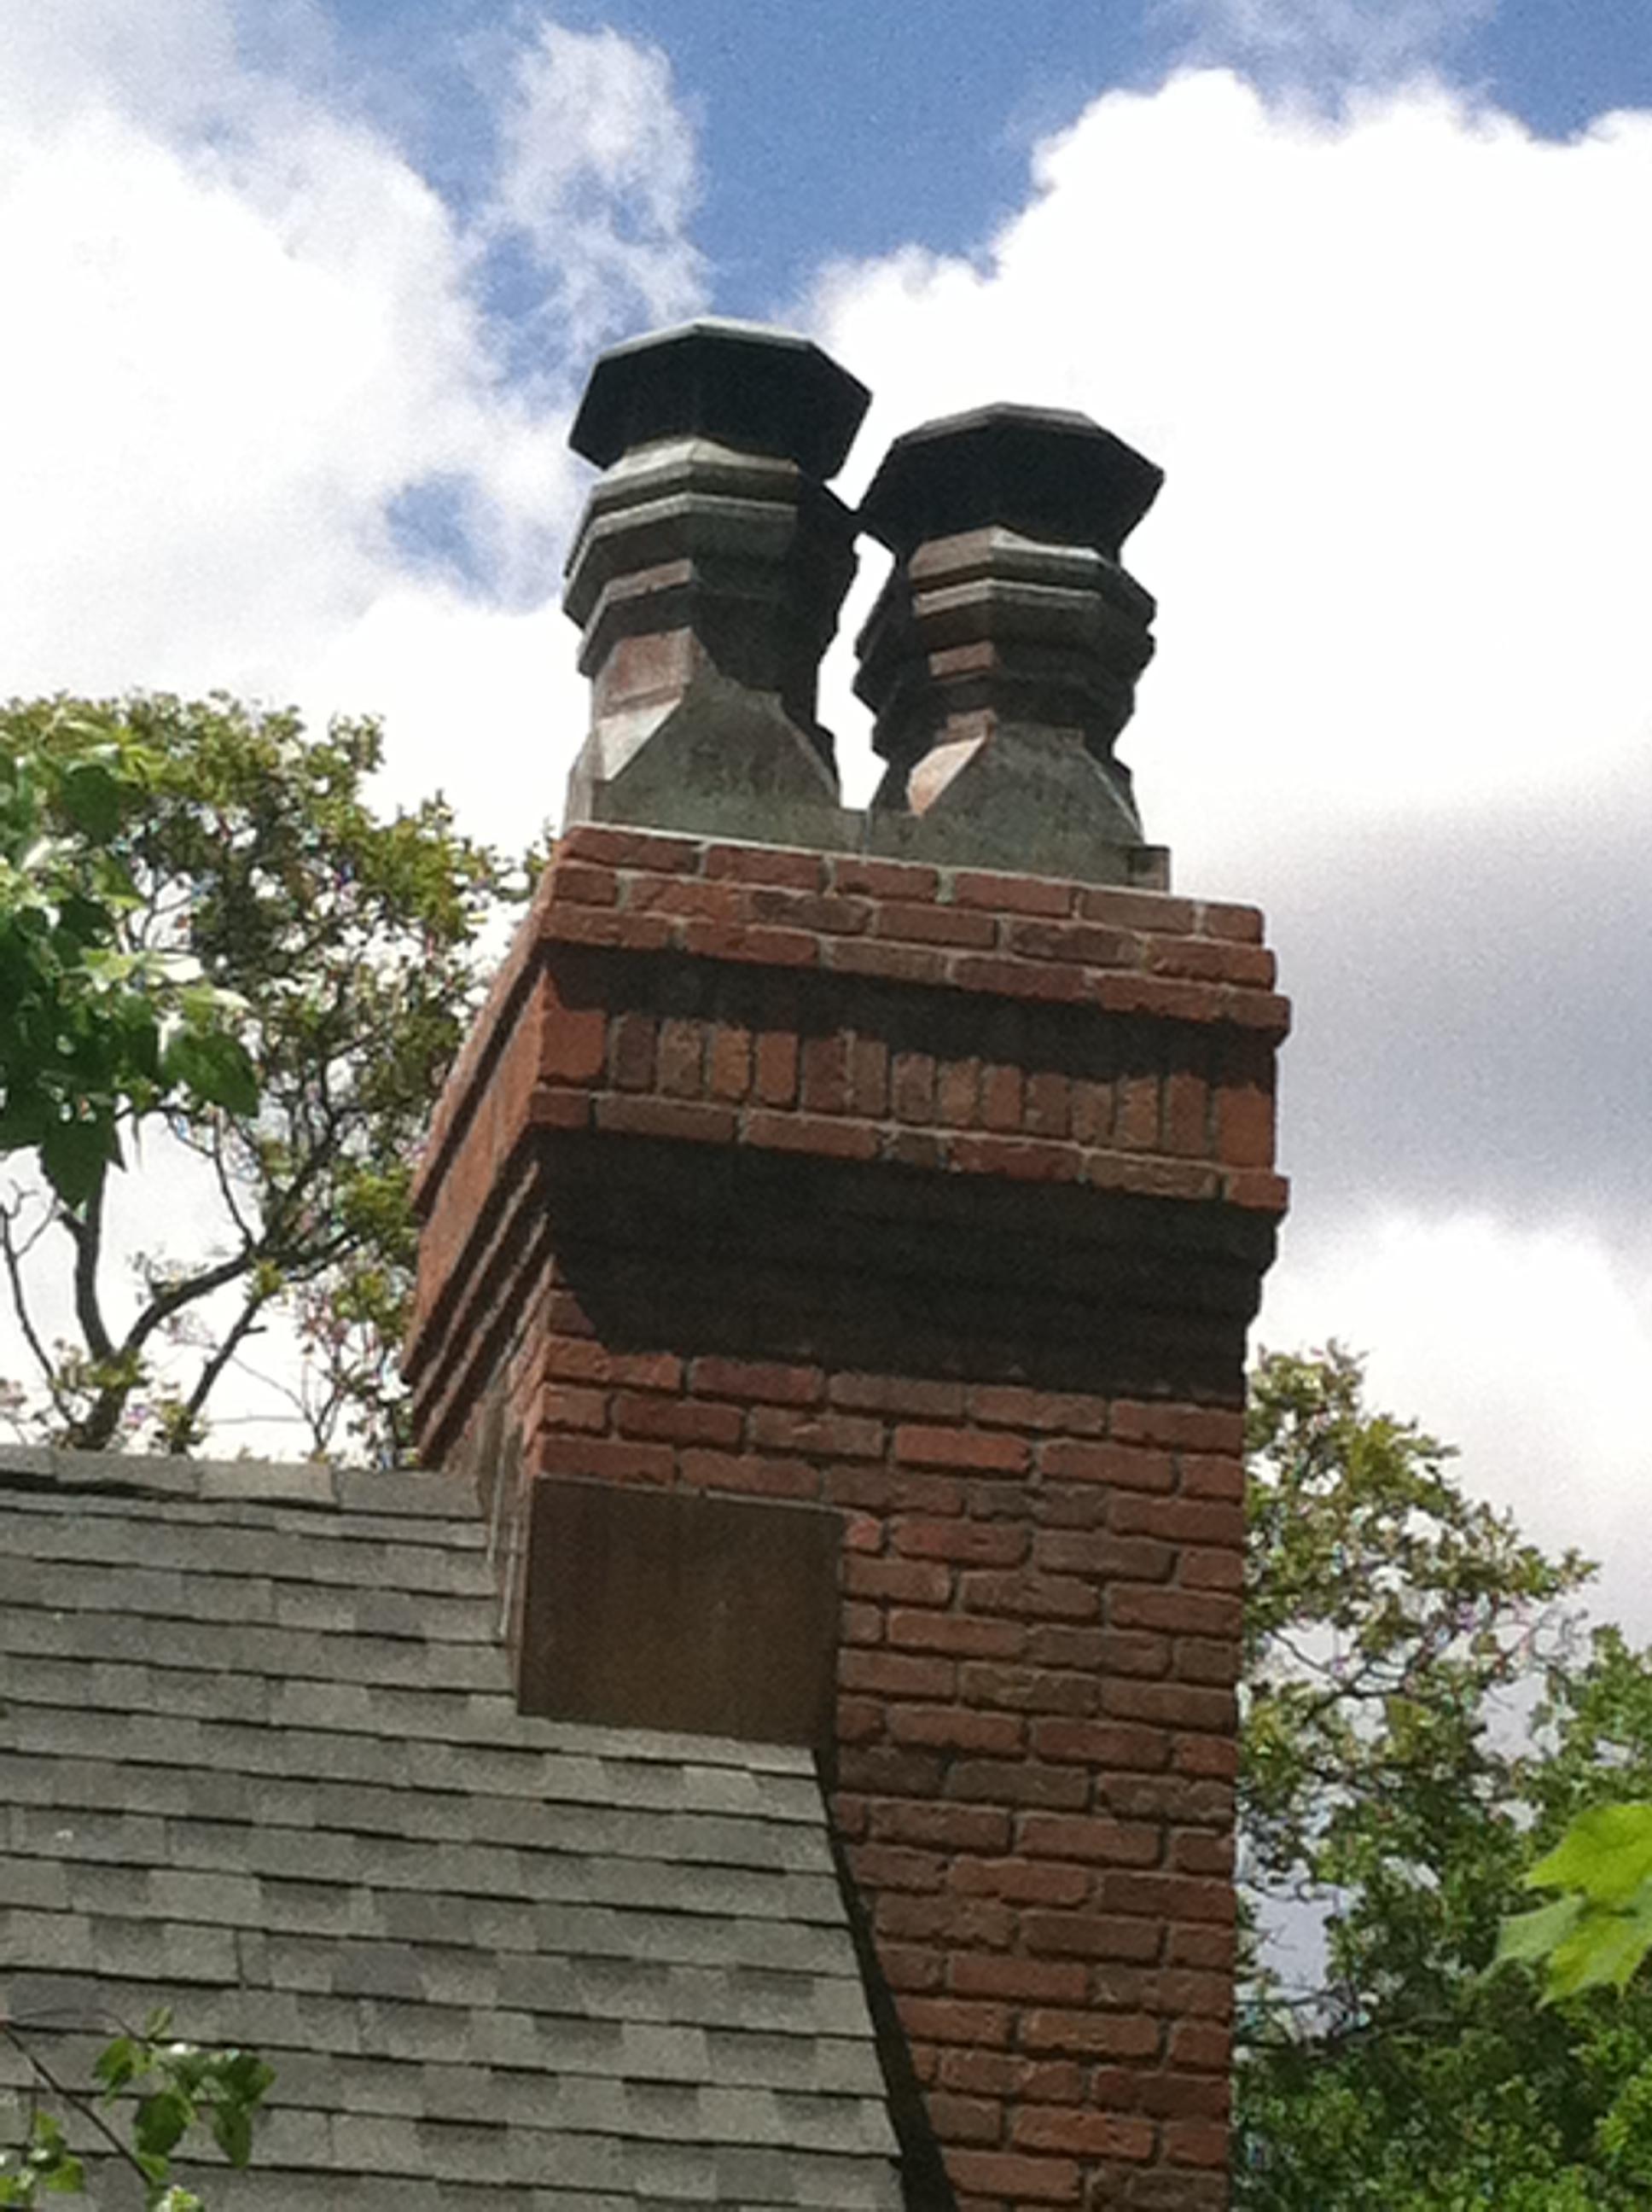 Volko Supply Tudor Copper Chimney Pots